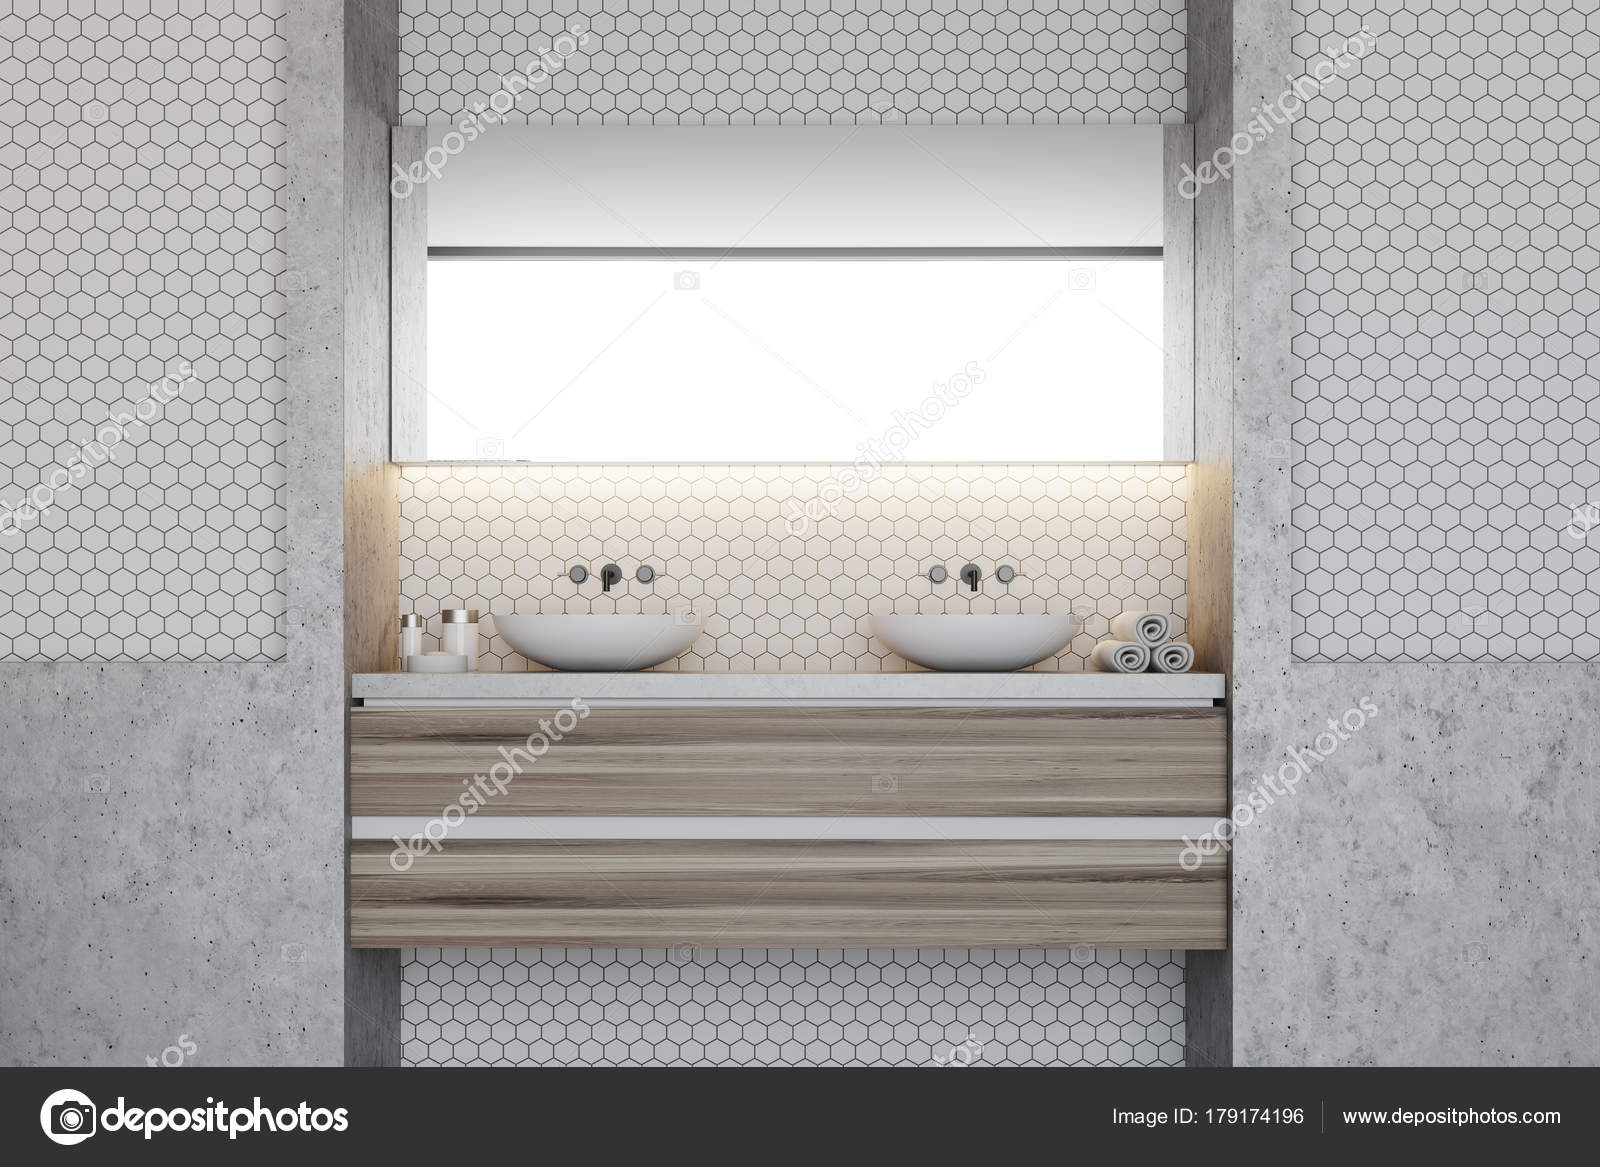 Hexagon Tegels Badkamer : Hexagon tegels badkamer dubbele wastafel u stockfoto